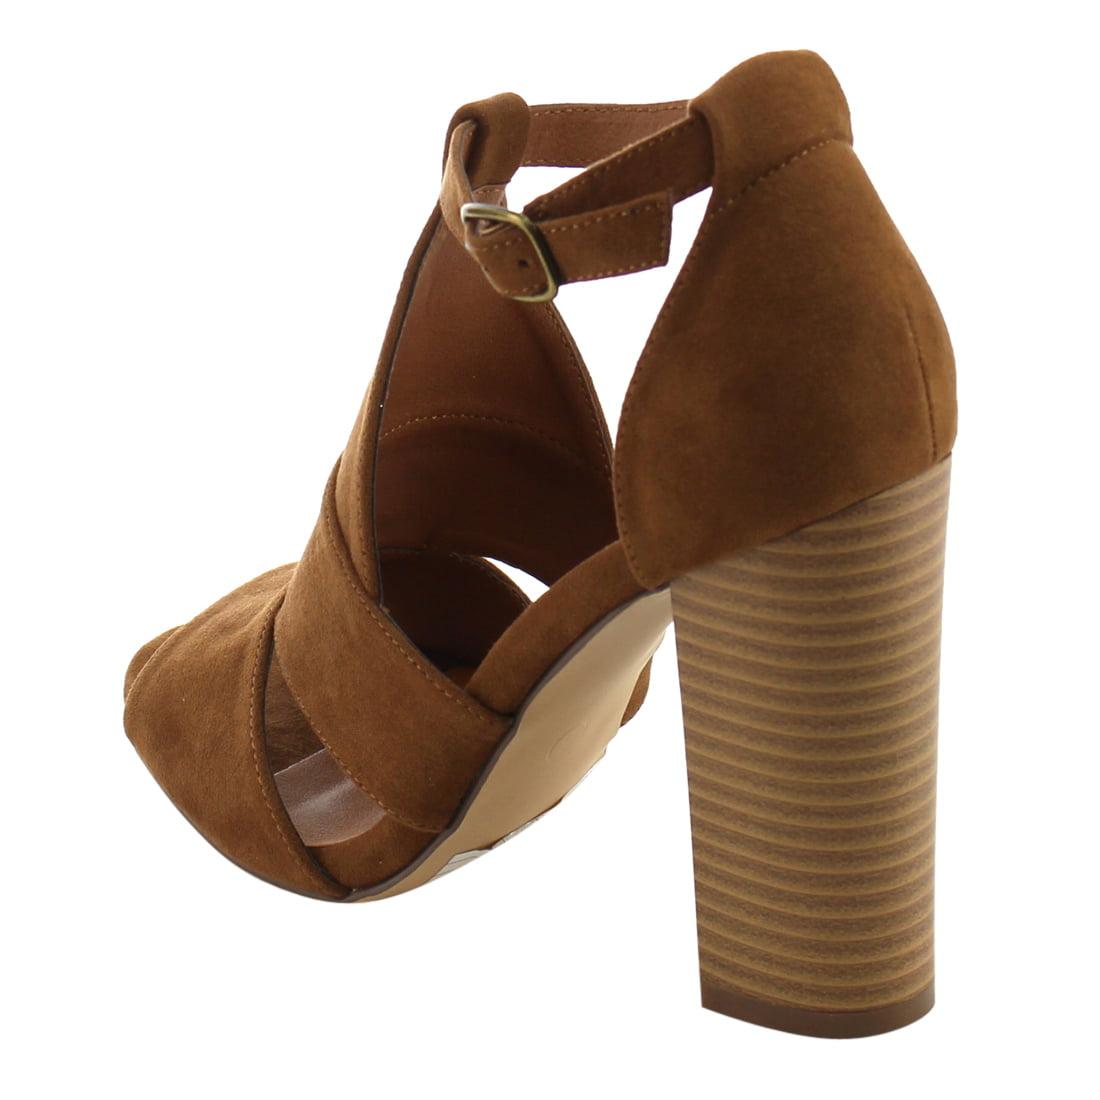 0b5212db20e5 BONNIBEL FI42 Women s Peep Toe Chunky Stacked Heel Ankle Strap Dress Sandals  - Walmart.com